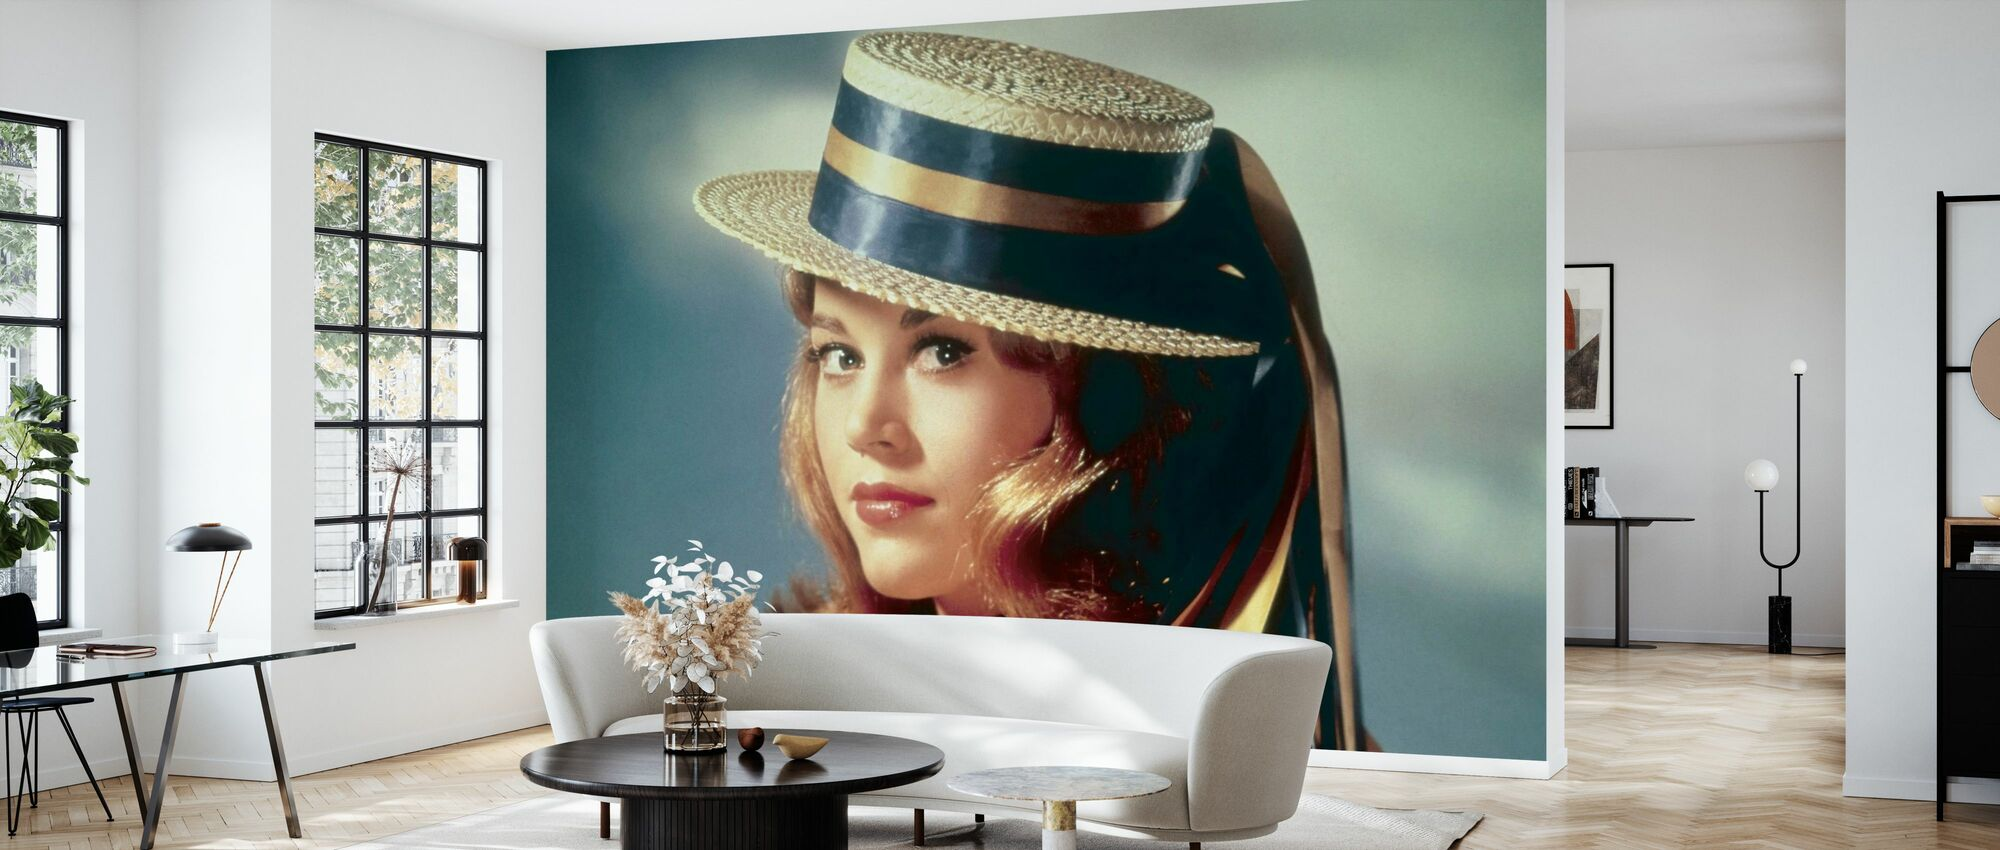 Jane Fonda - Wallpaper - Living Room